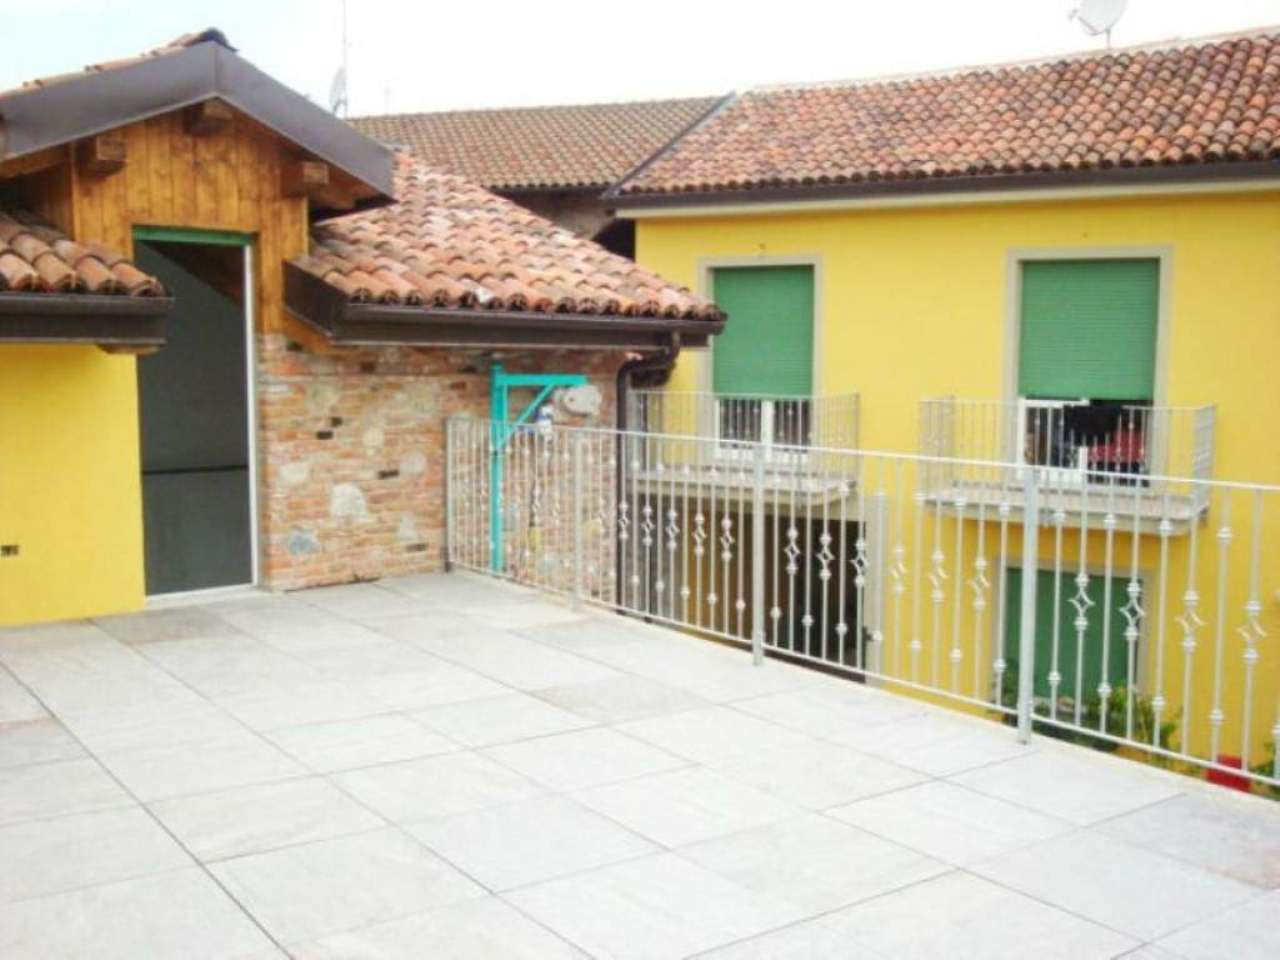 Bilocale Gassino Torinese Via Vittorio Veneto 8